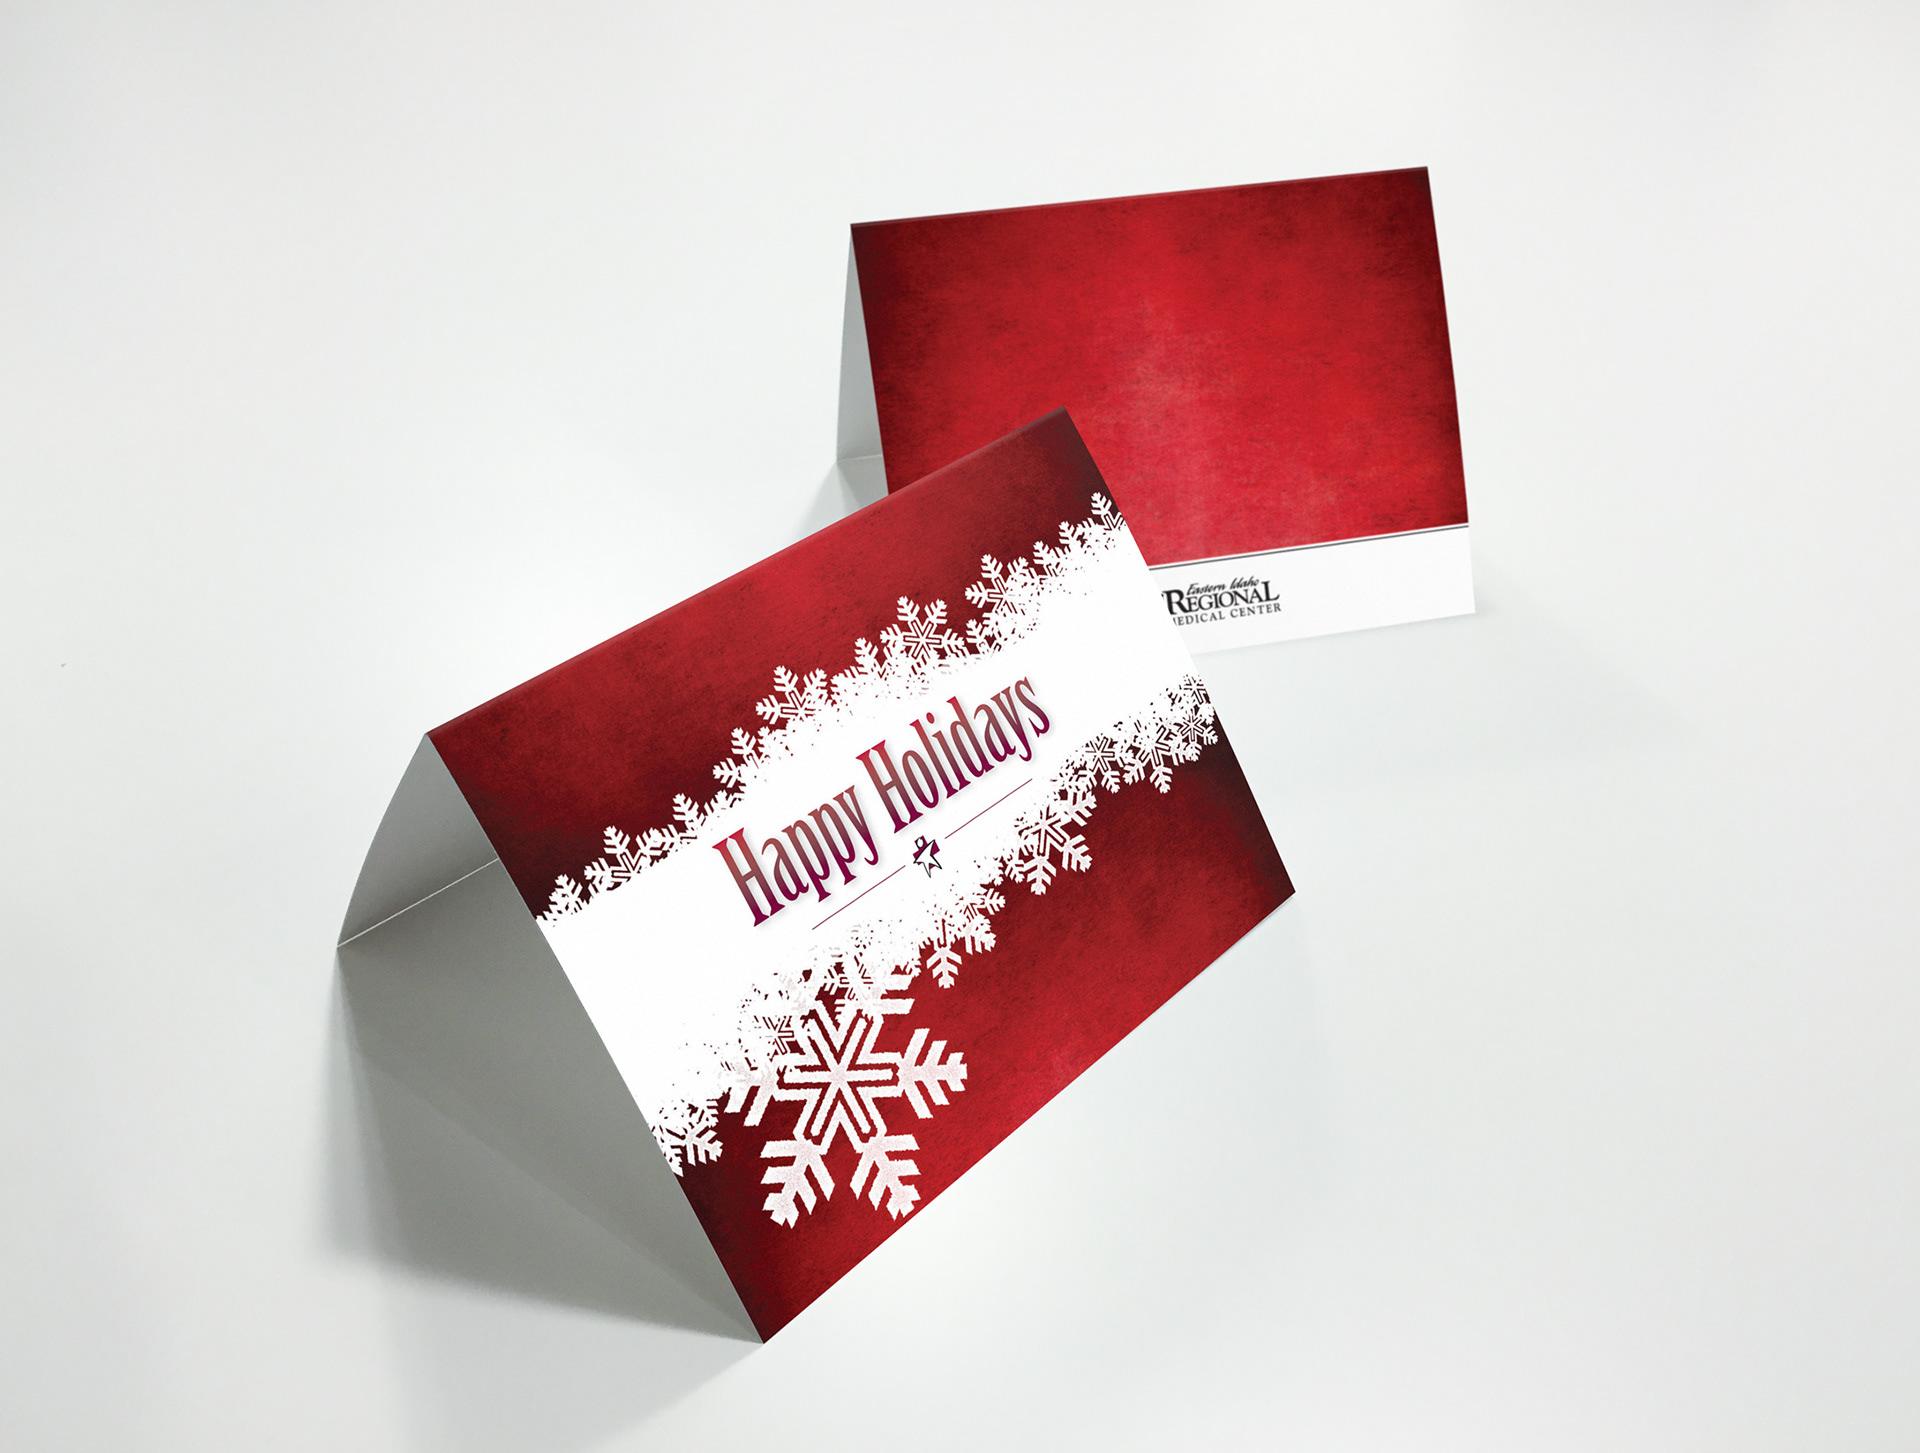 Karen hall custom holiday greeting cards eastern idaho regional medical center holiday greeting card 2014 m4hsunfo